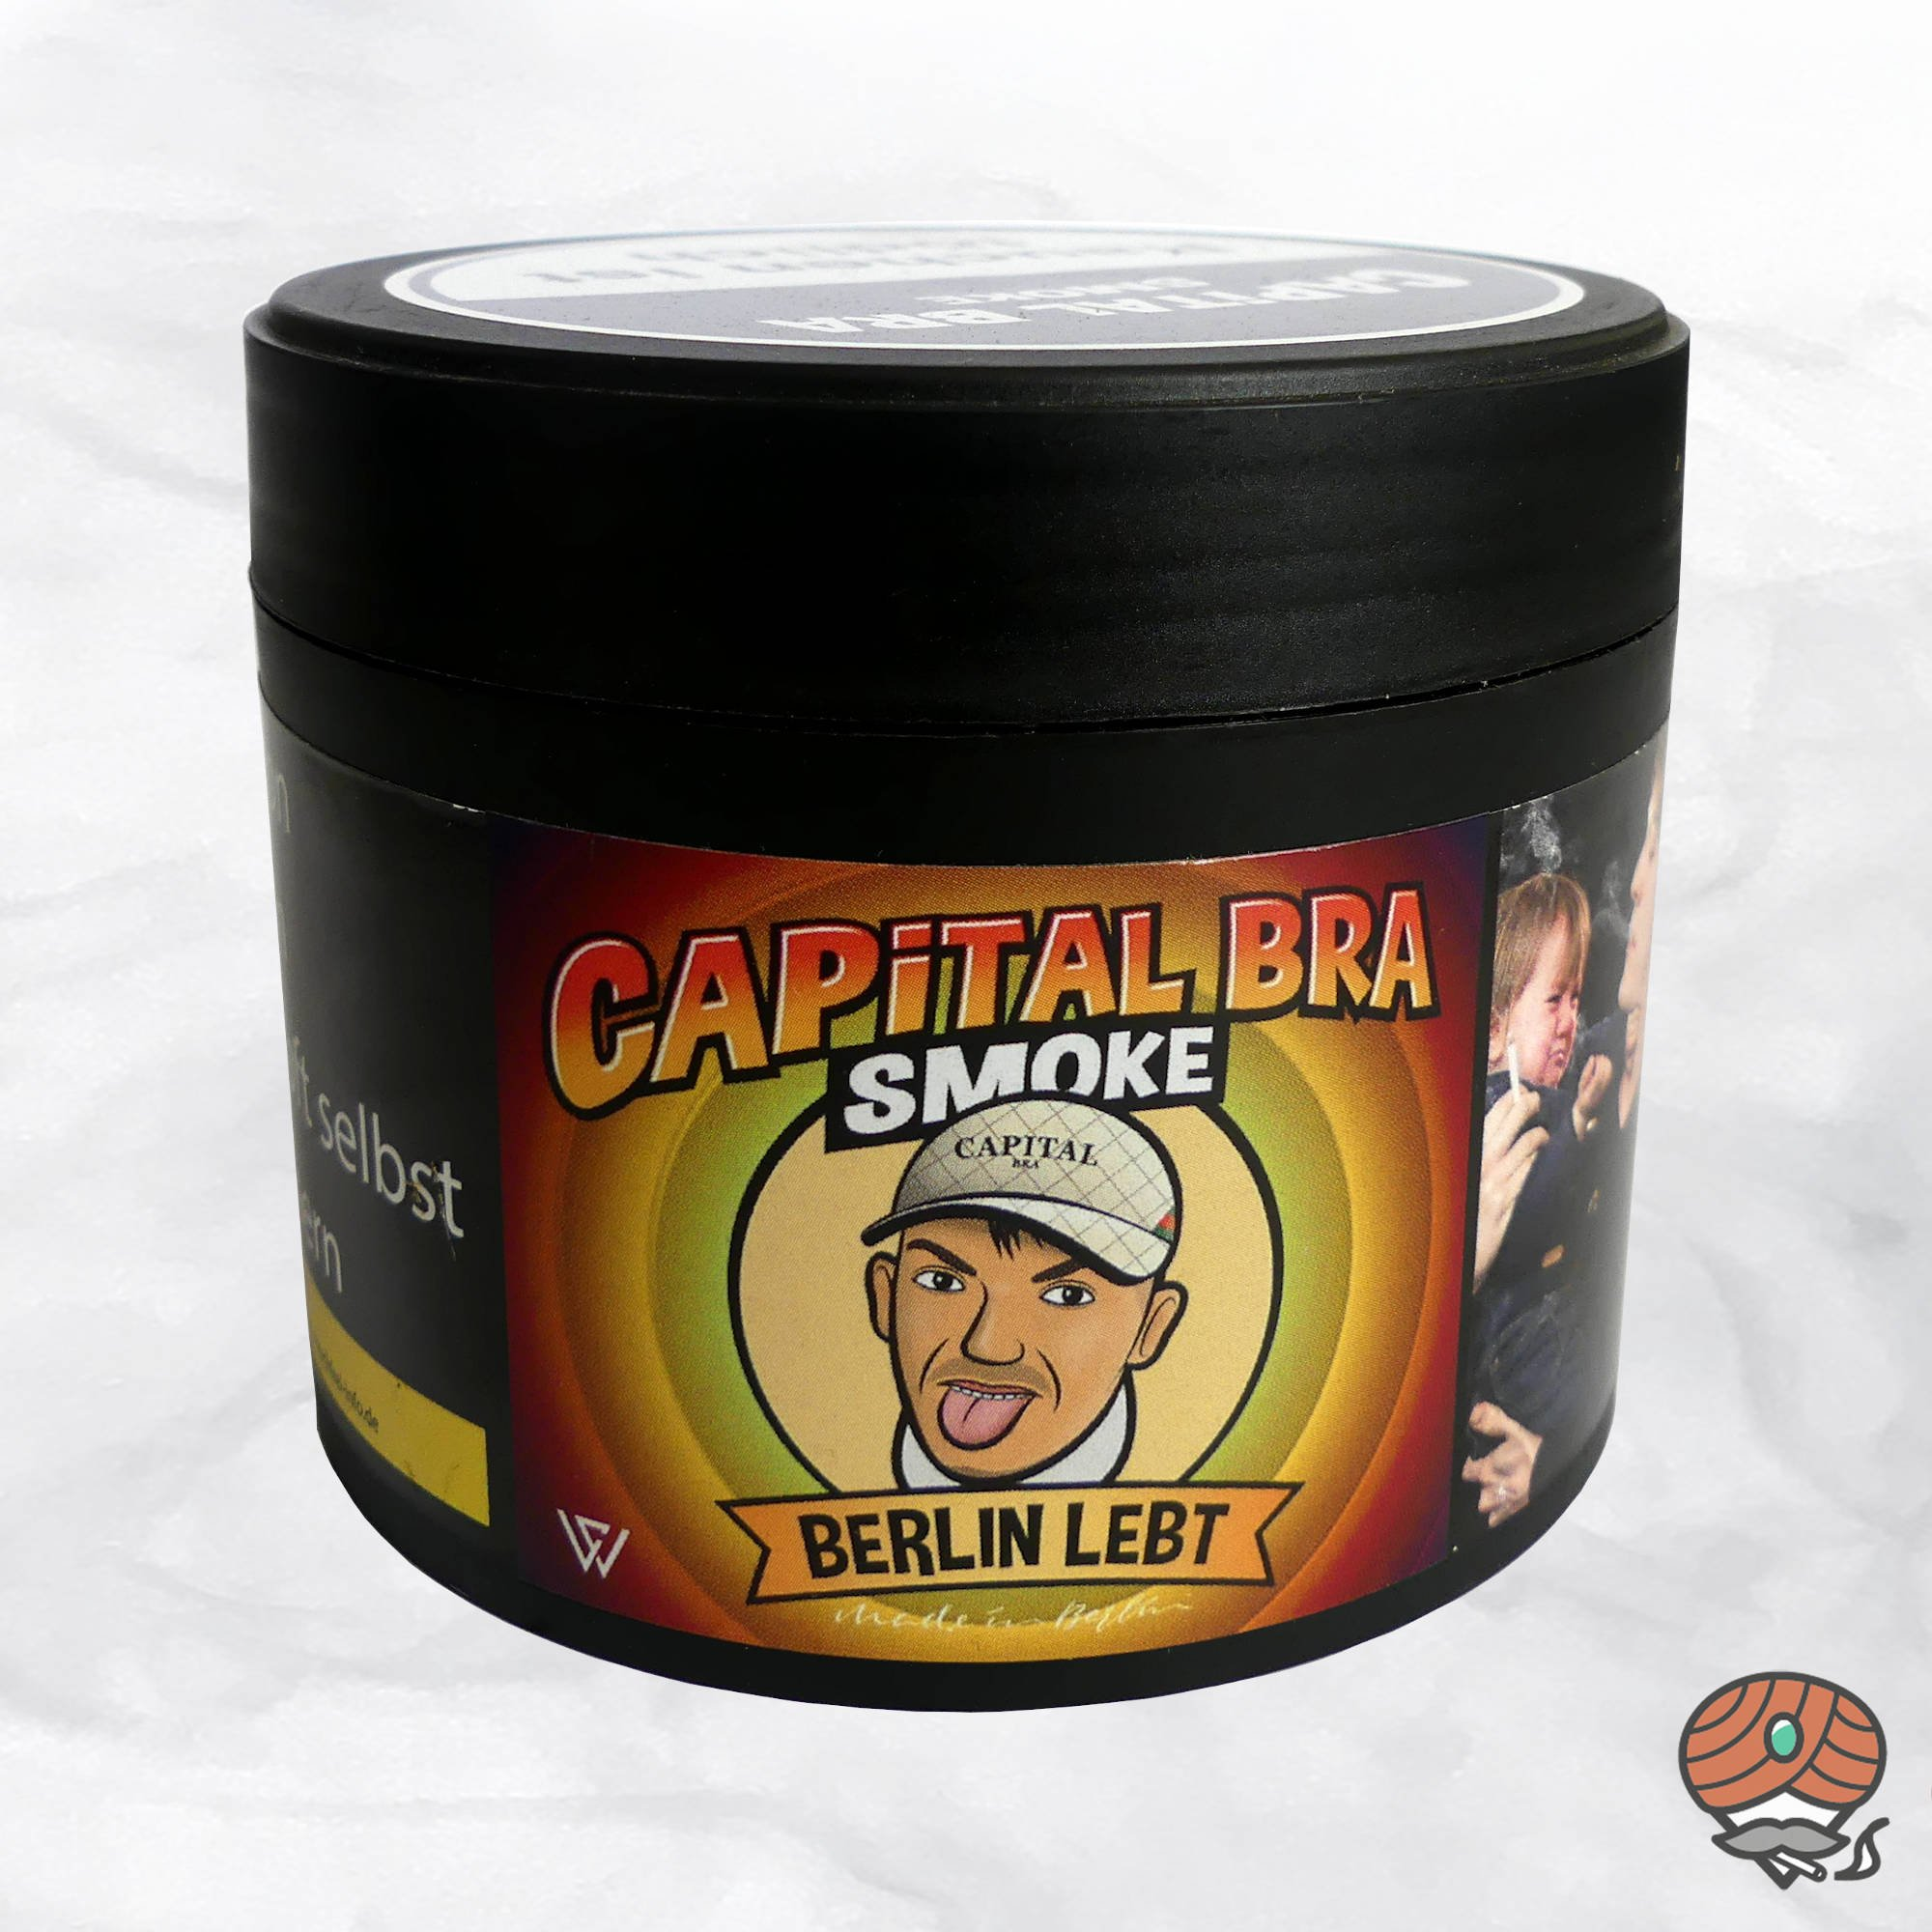 Capital Bra Smoke Shisha Tabak - Berlin lebt 200g